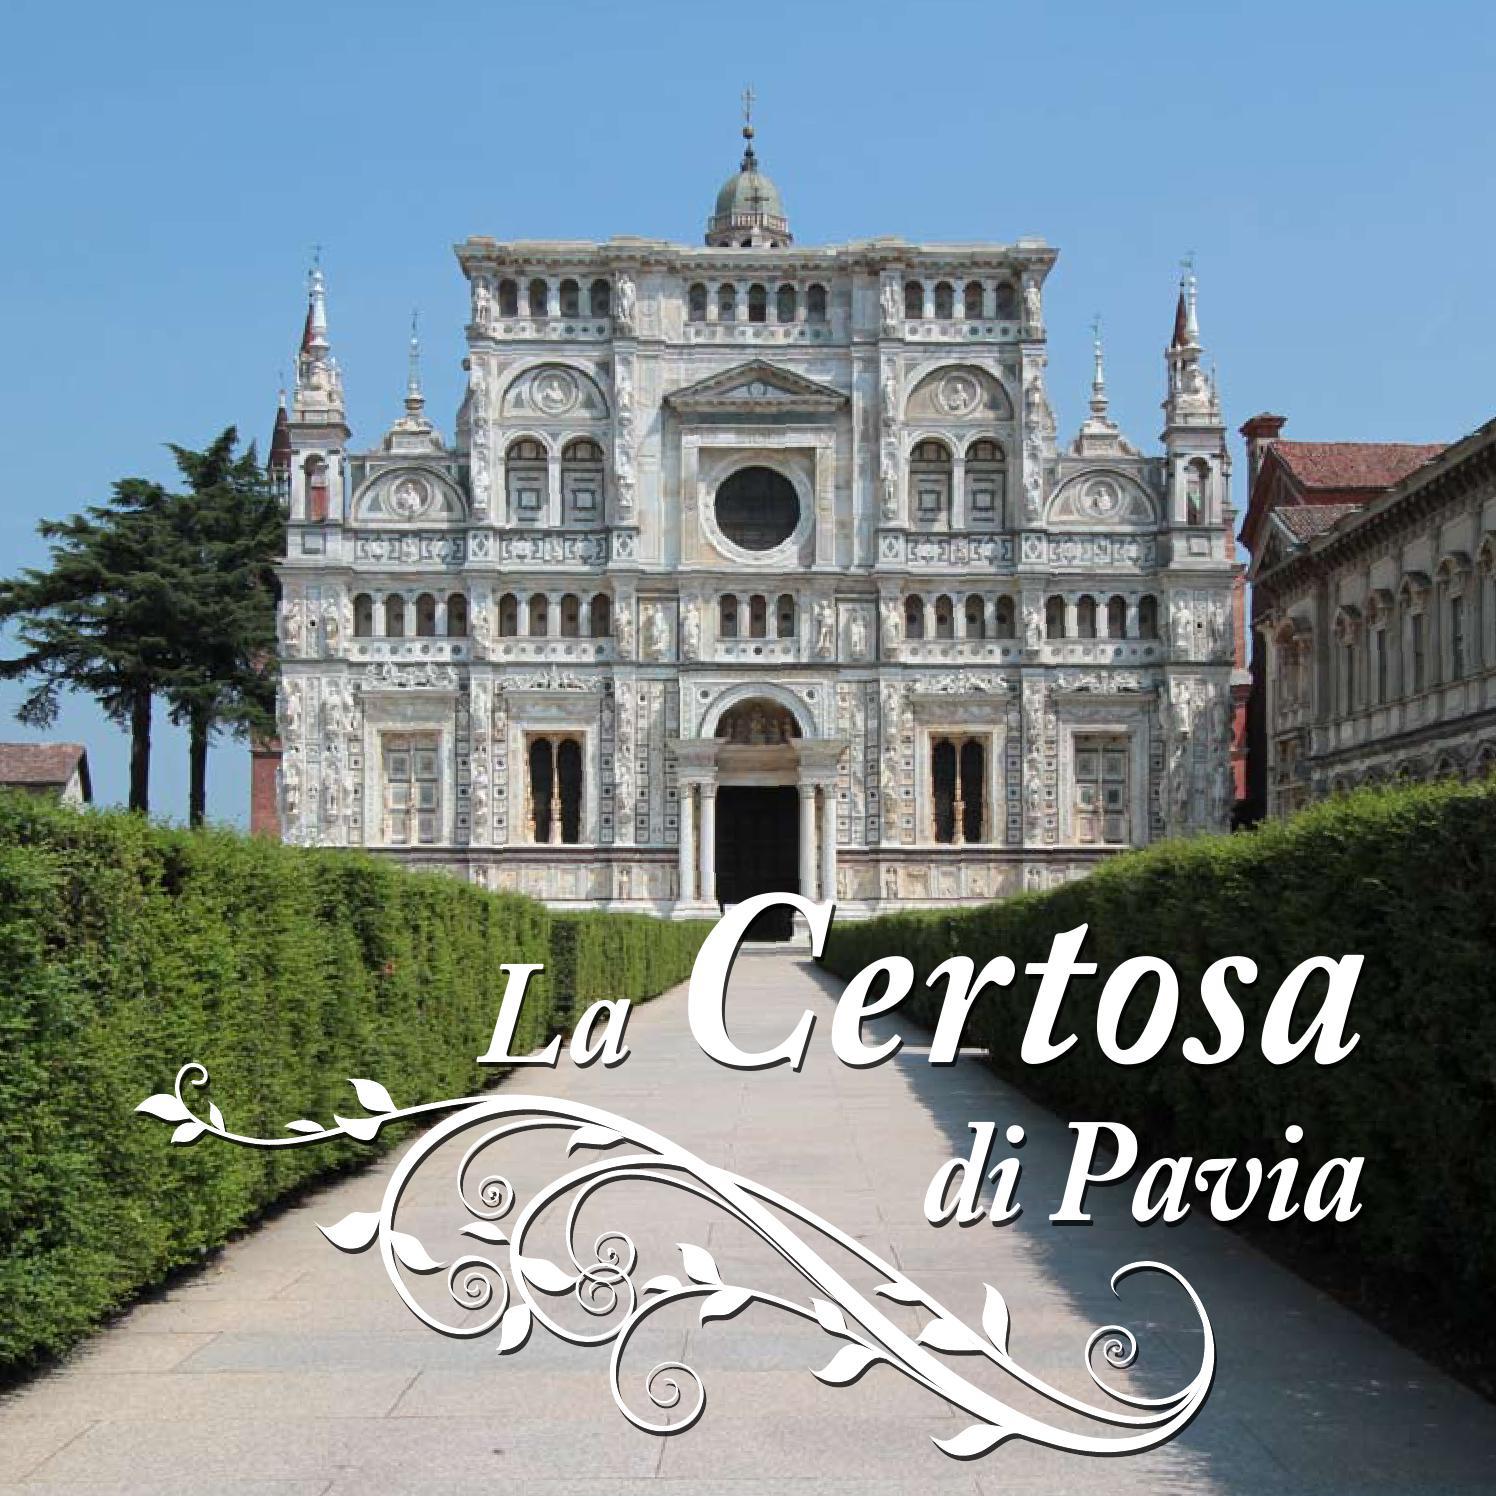 La Certosa Di Hotel Monumento Pavia Issuu By JTK3lF1c